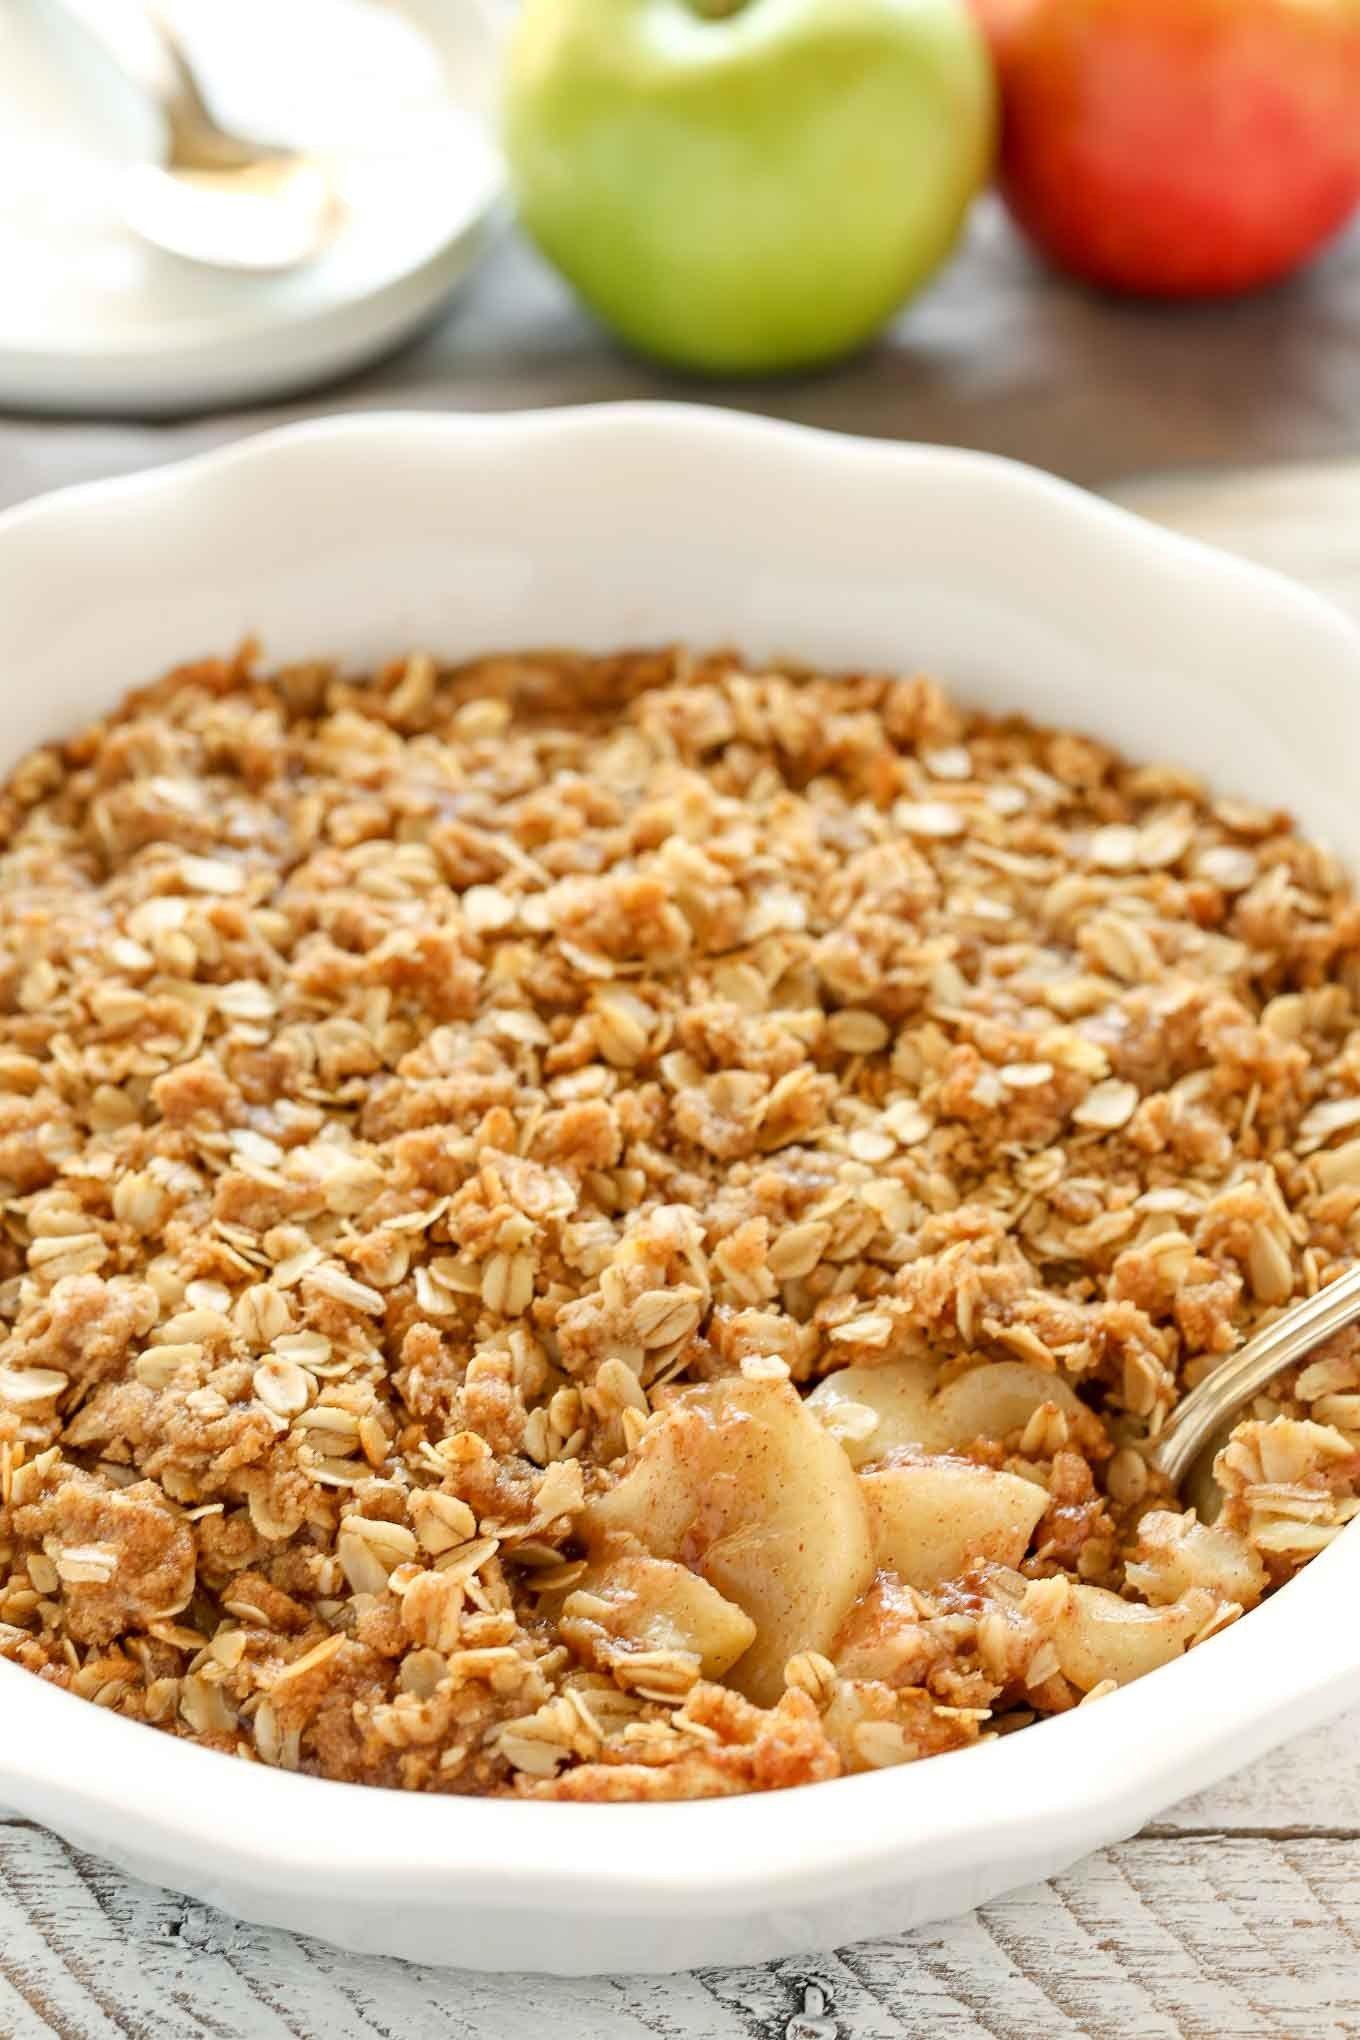 An easy cinnamon apple crisp recipe made with sliced